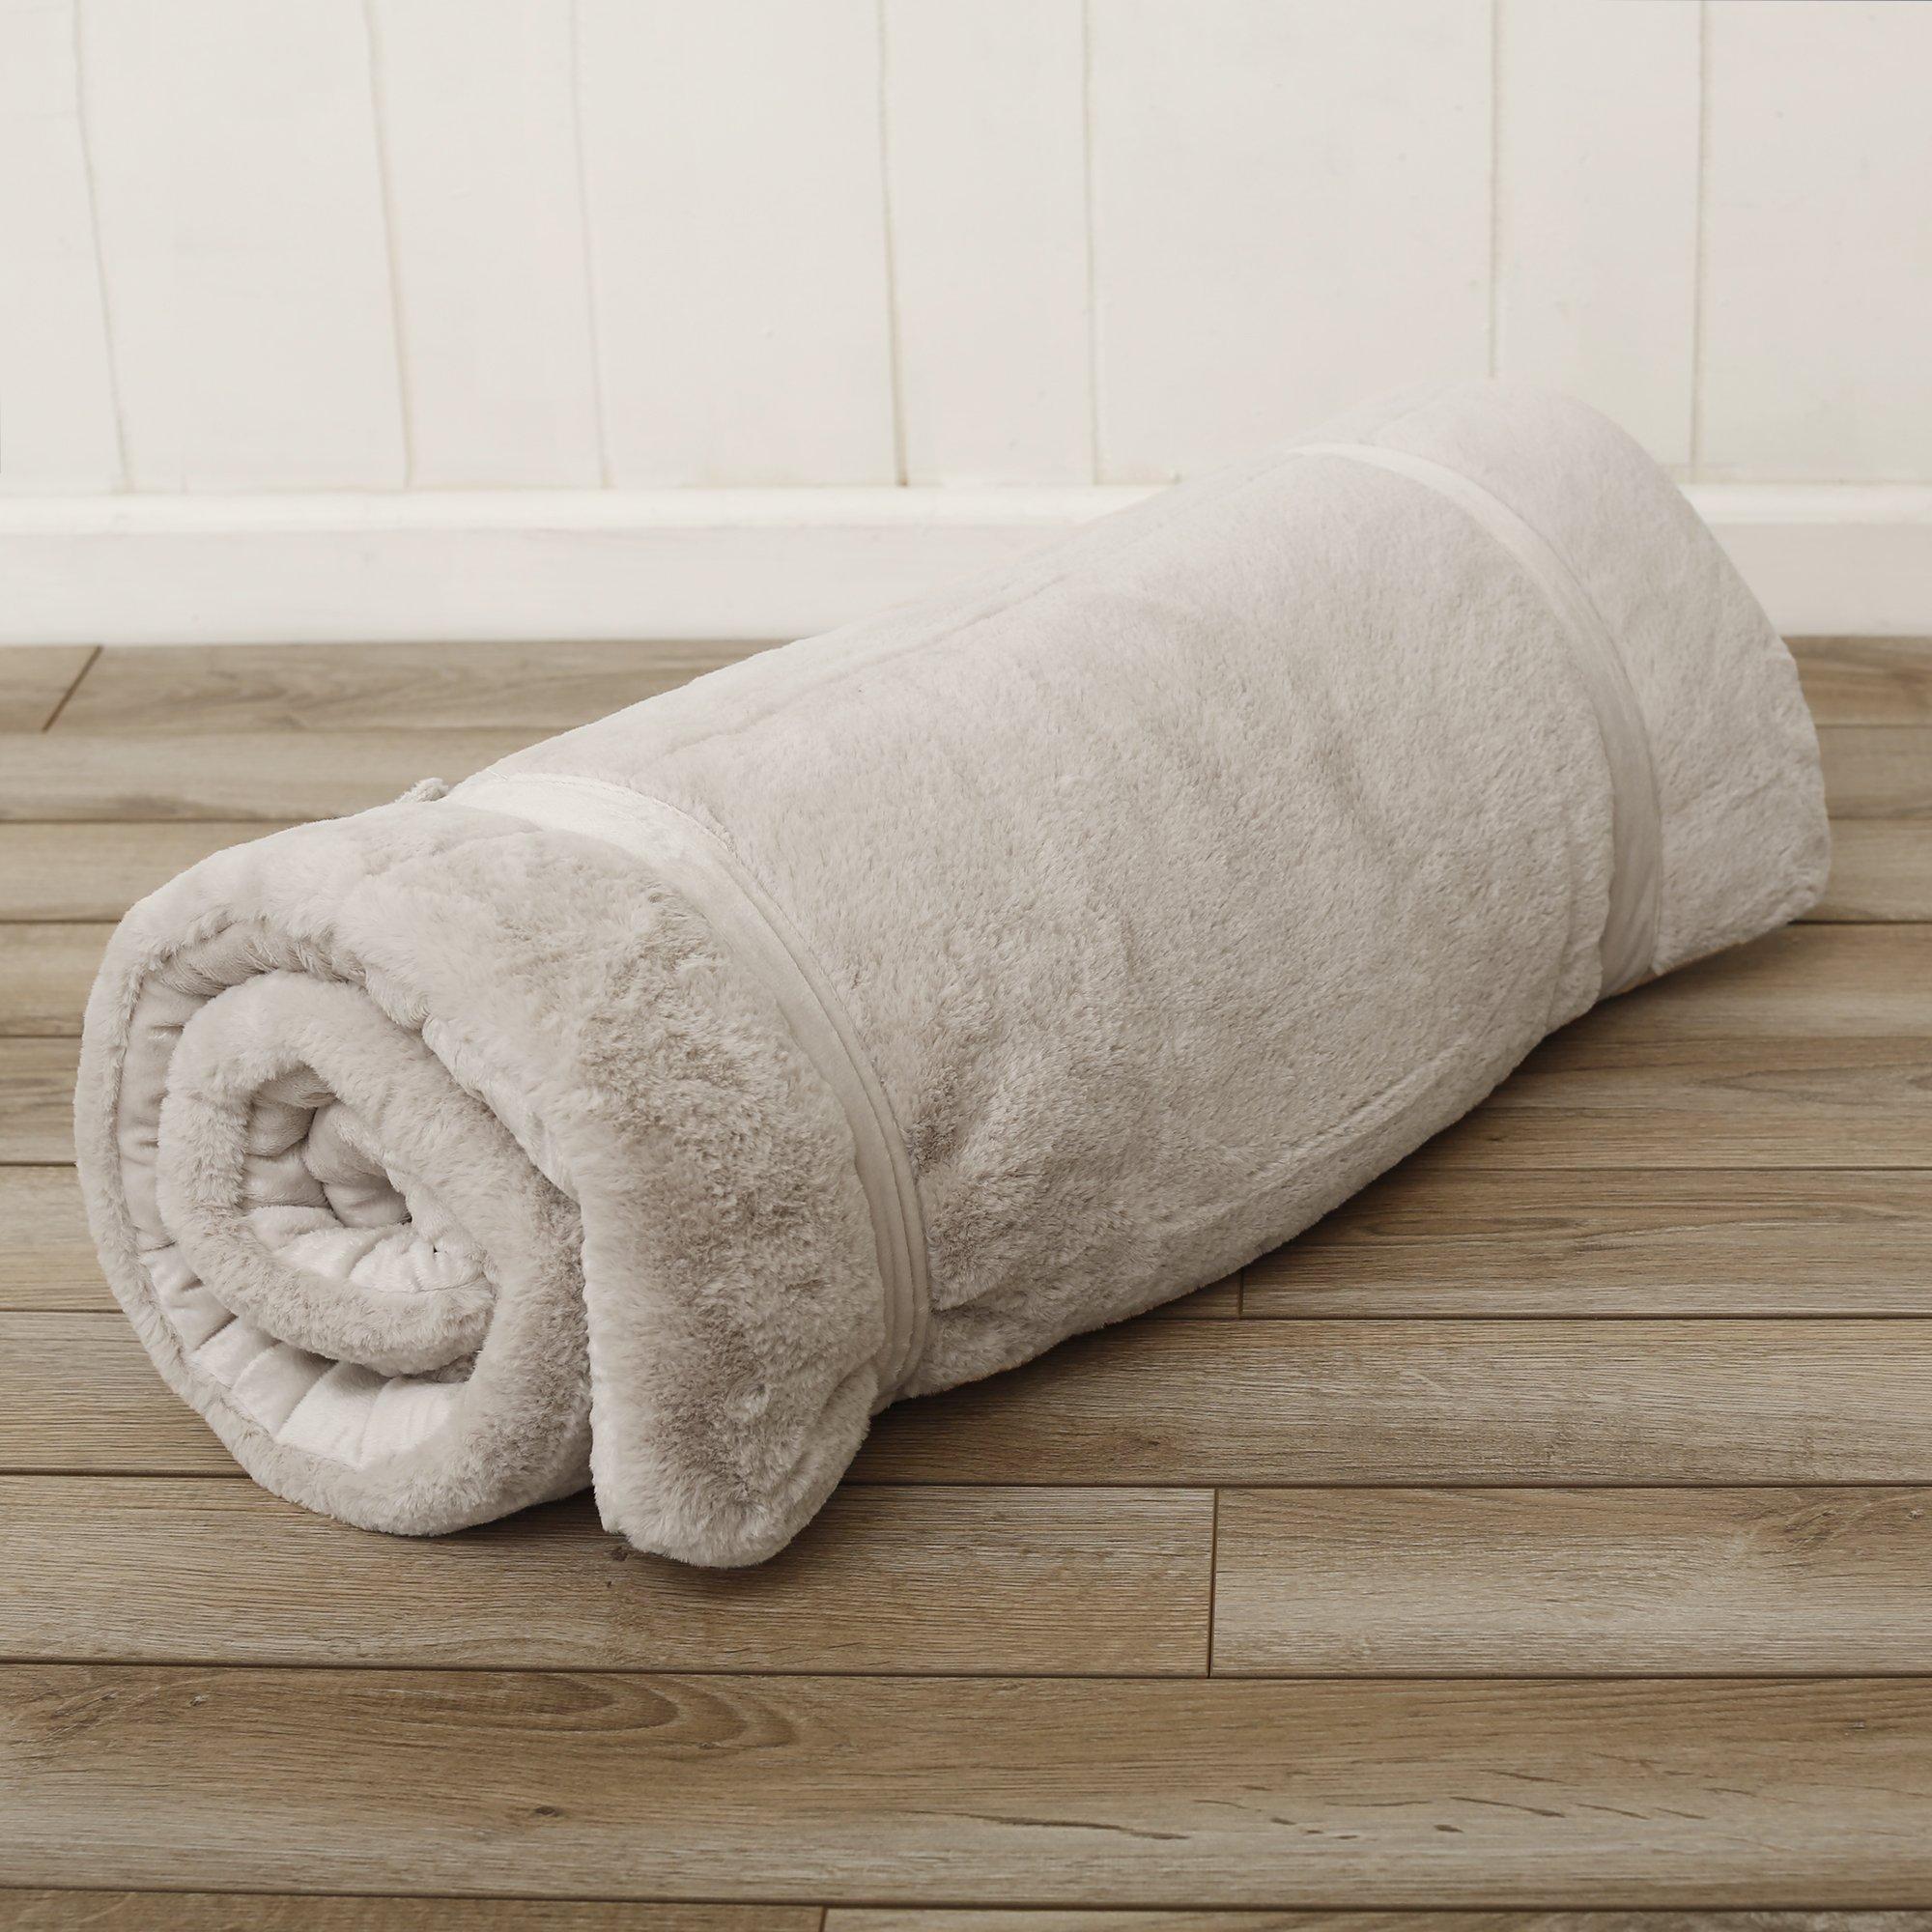 Best Home Fashion Plush Faux Fur Hooded Dog Animal Sleeping Bag - Taupe - 27''W x 59''L - (1 Sleeping Bag) by Best Home Fashion (Image #6)